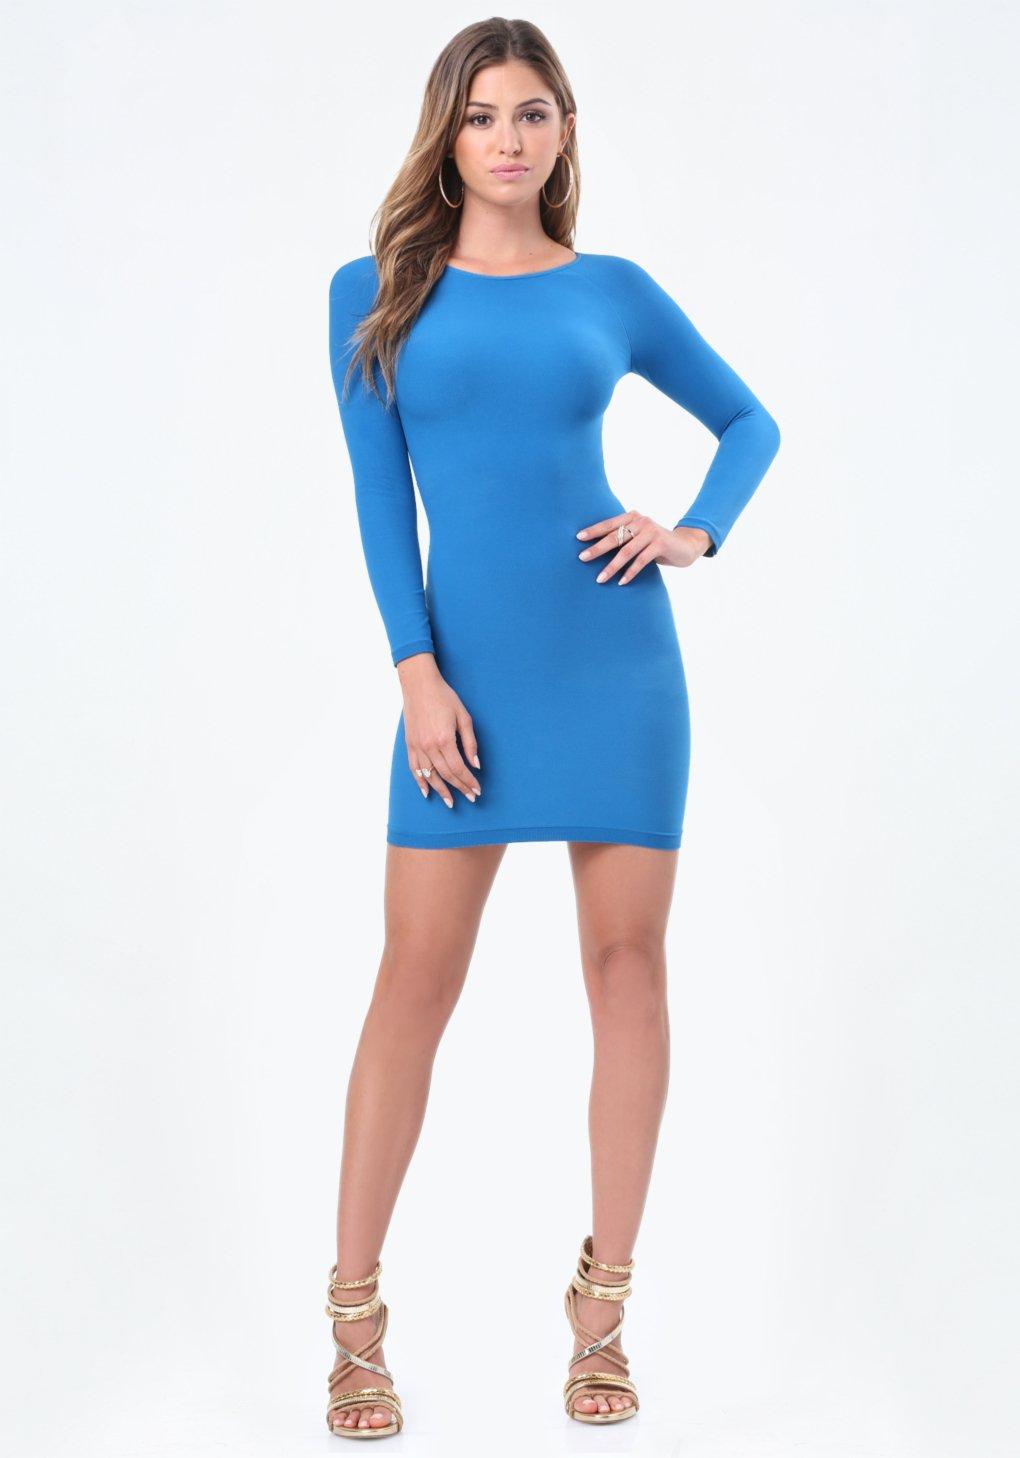 Lyst Bebe Raglan Sleeve Bodycon Dress In Blue